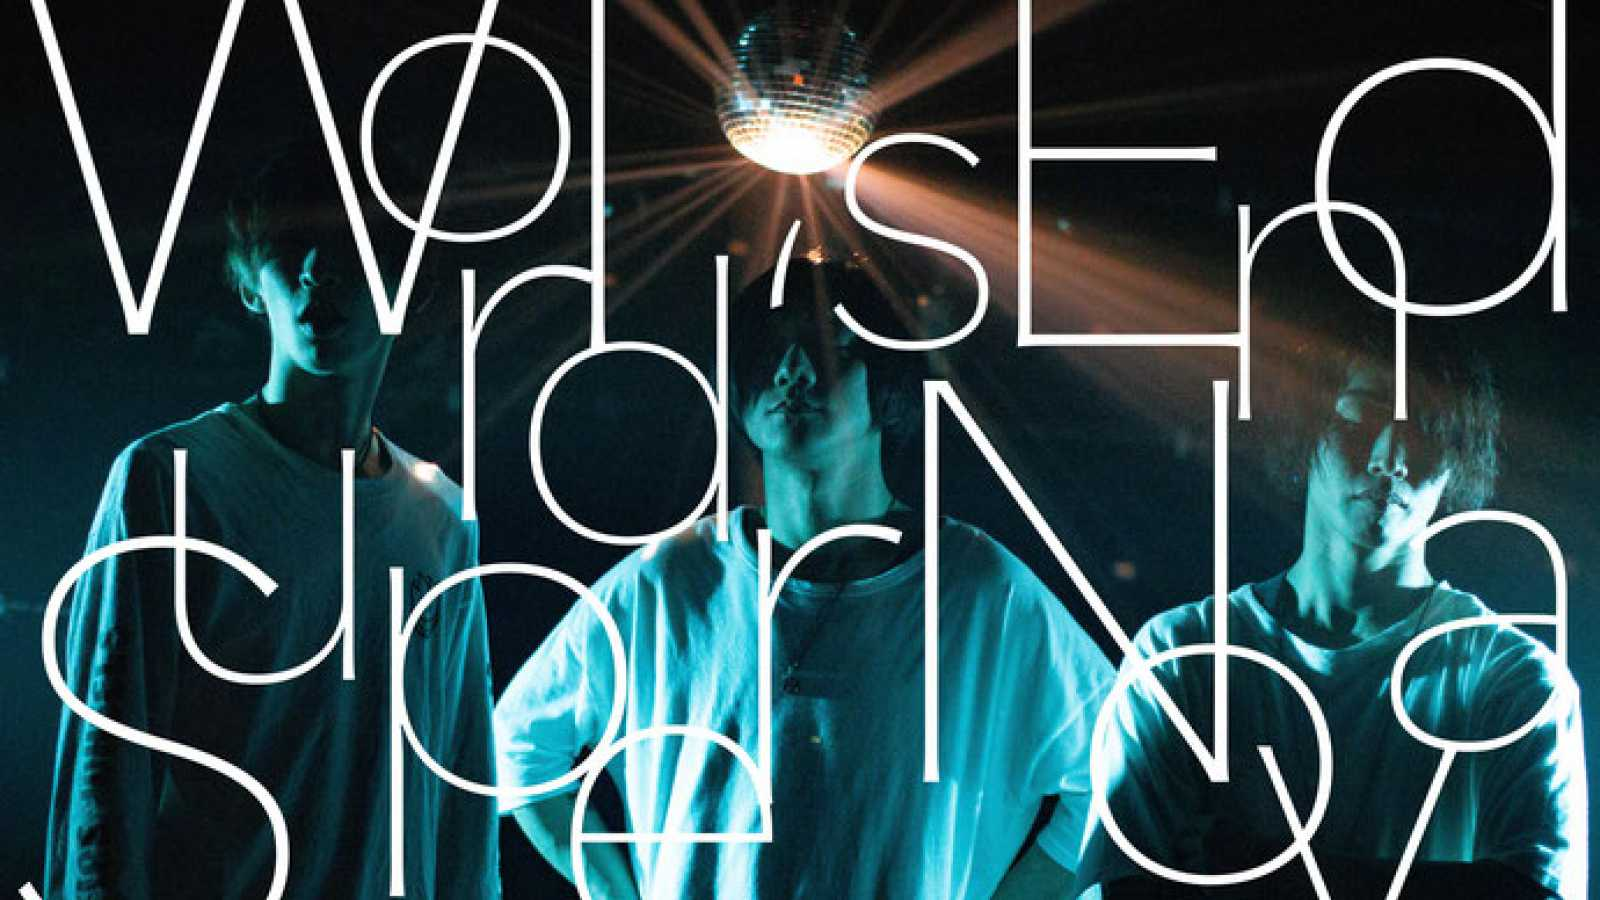 New Digital Mini-Album from World's End Super Nova © World's End Super Nova. All rights reserved.